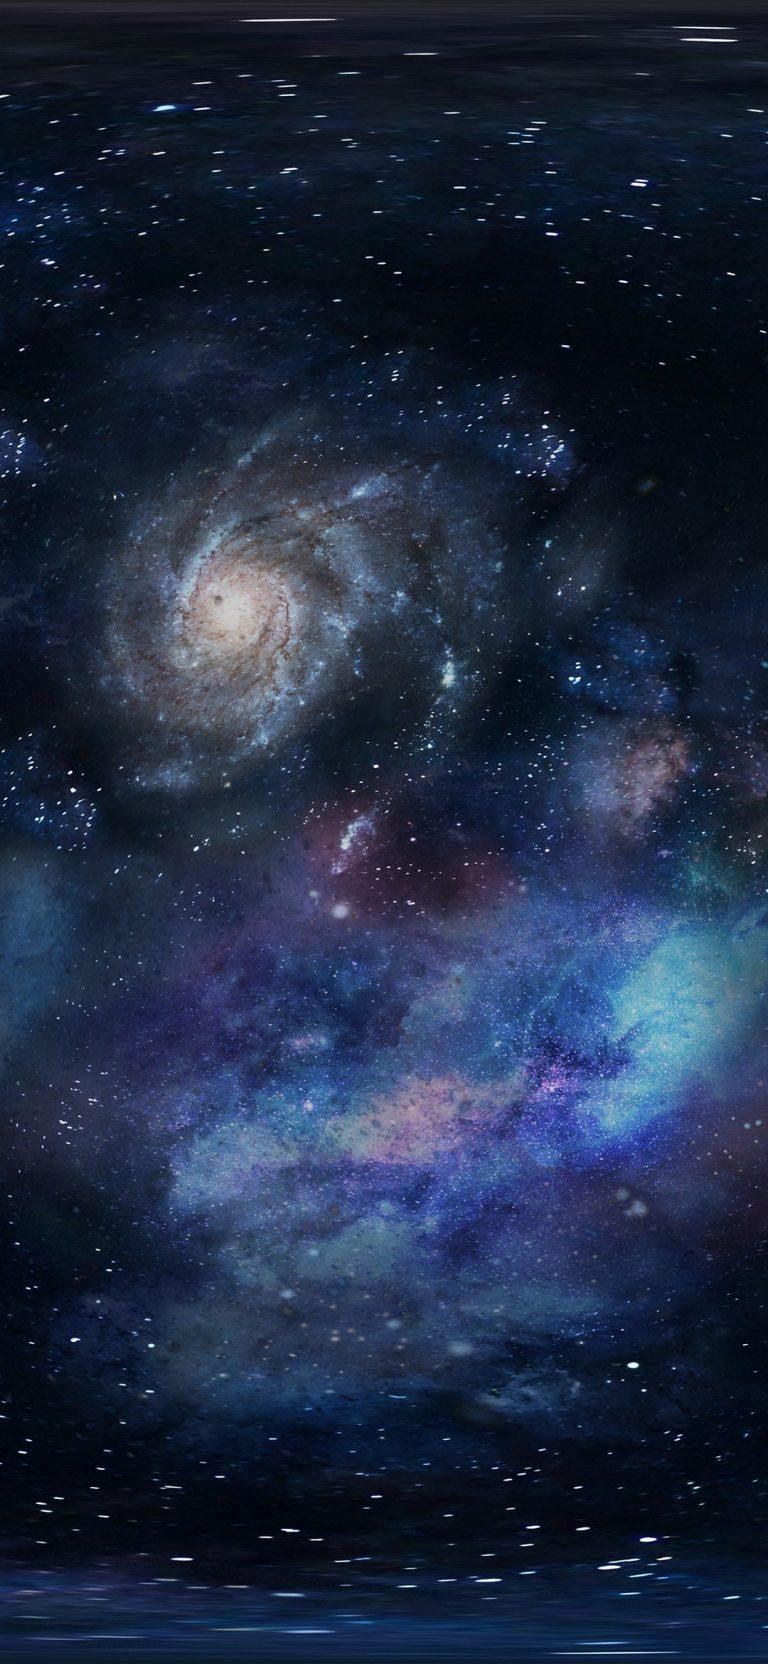 Space Phone Wallpaper 163 1080x2340 768x1664